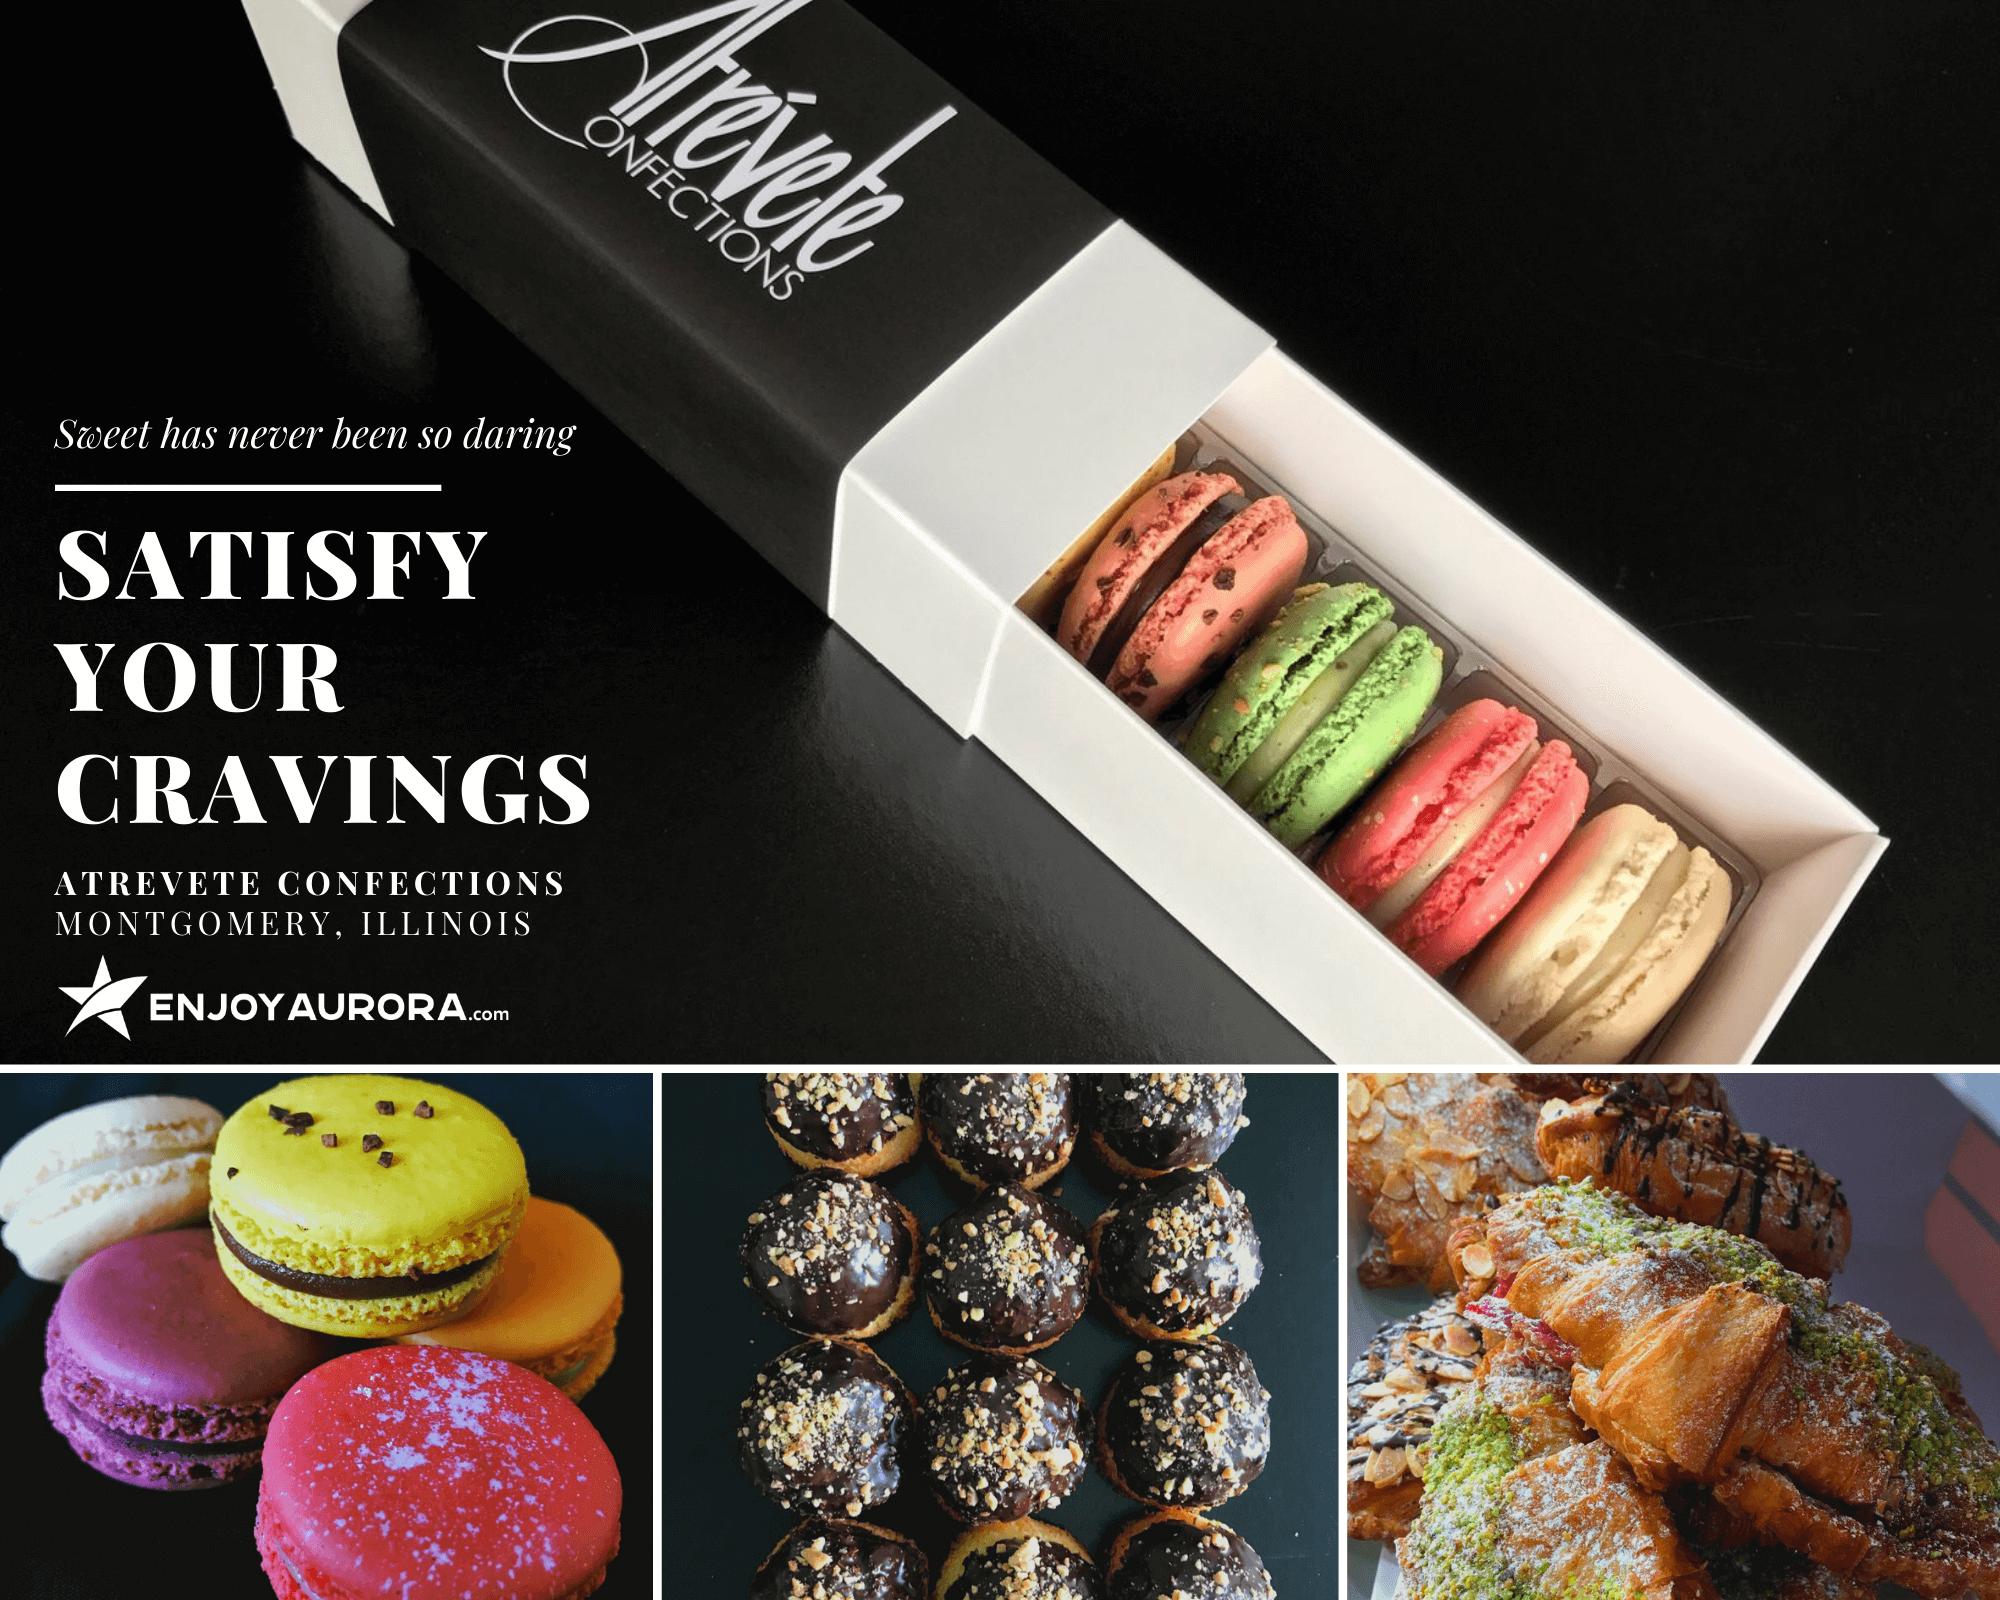 /craving-sweets-chocolates-atrevete-confections